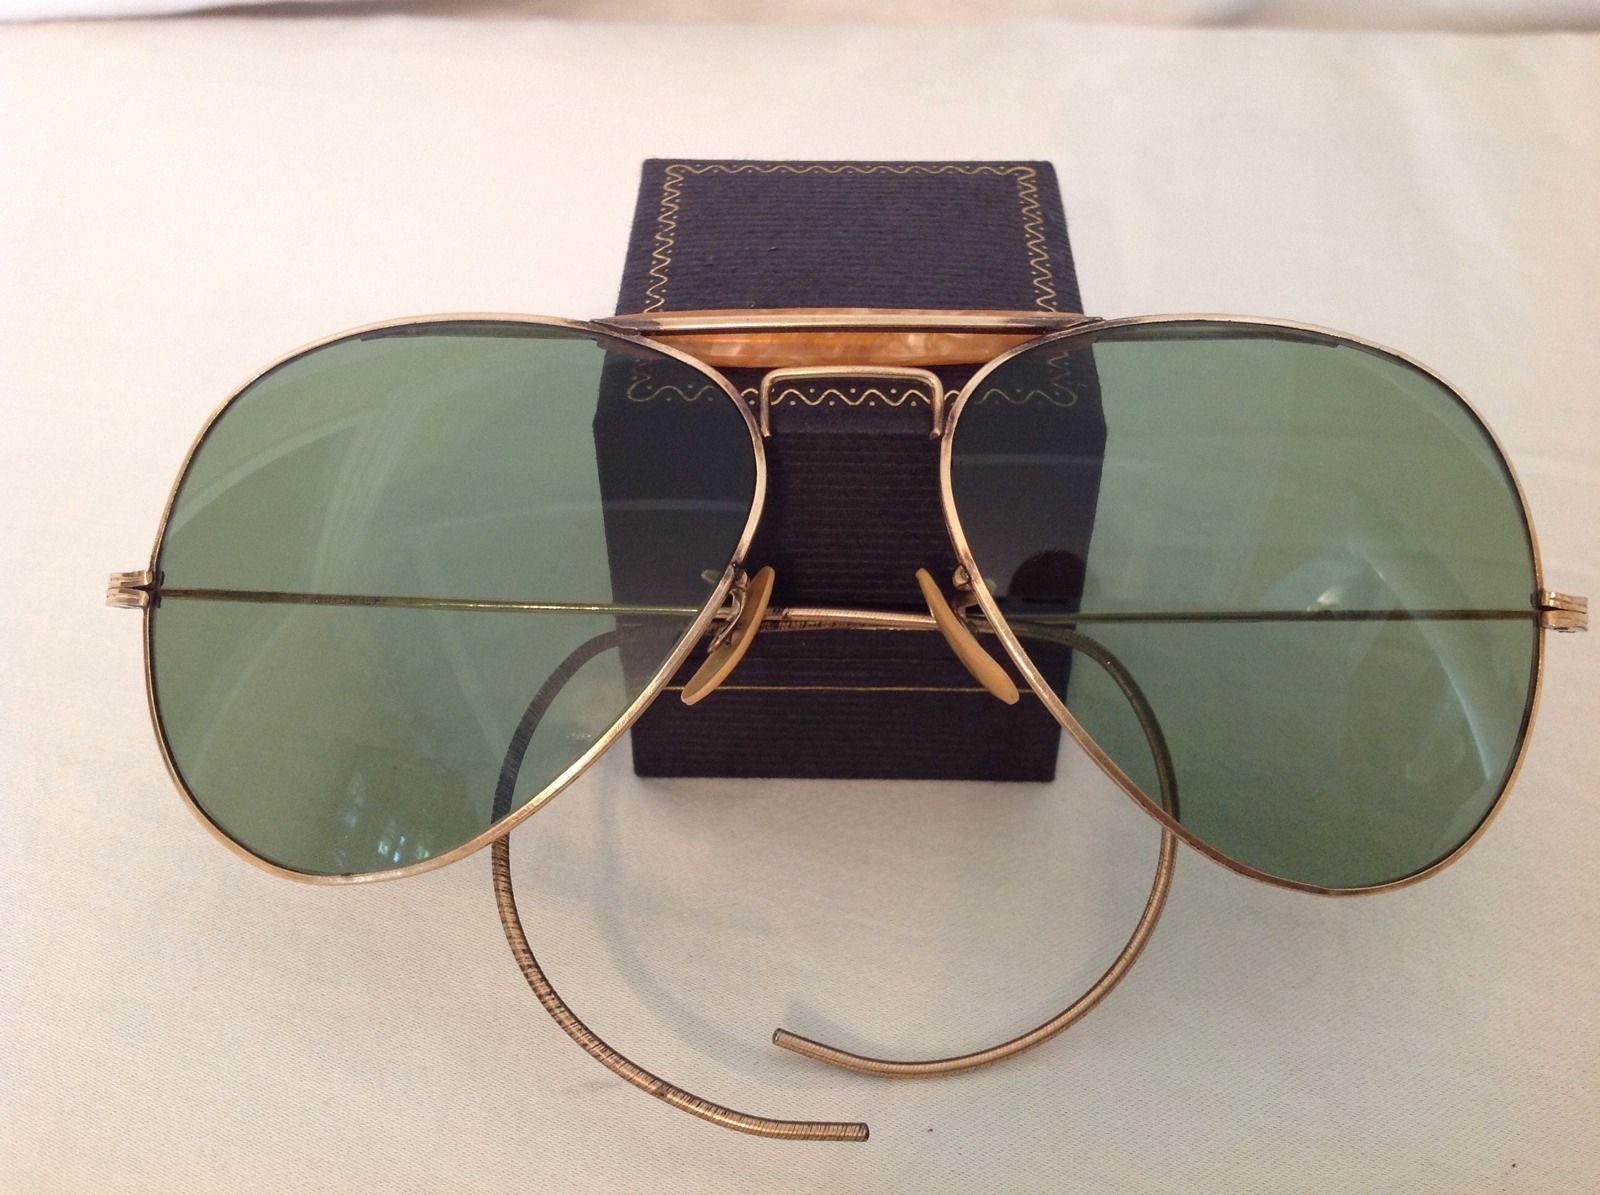 WWII Aviator Sunglasses 1 10 12K GF   eBay   Ray Ban Vintage   Pinterest fbe2915cf05e